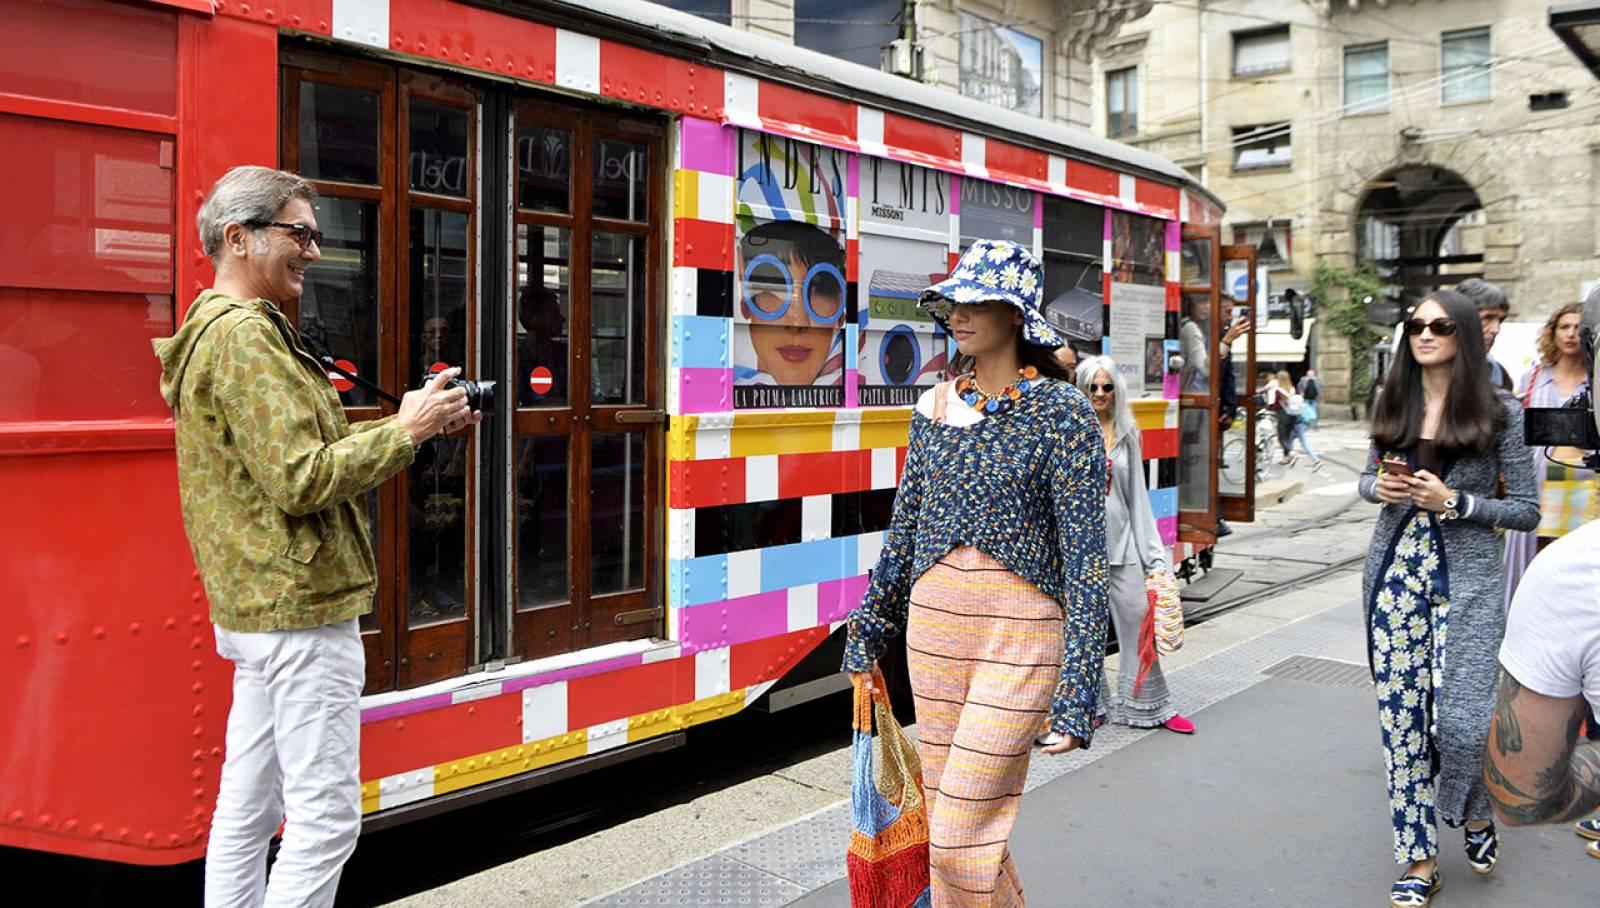 Pubblicità sui tram milanesi IGPDecaux tram decorato per M Missoni